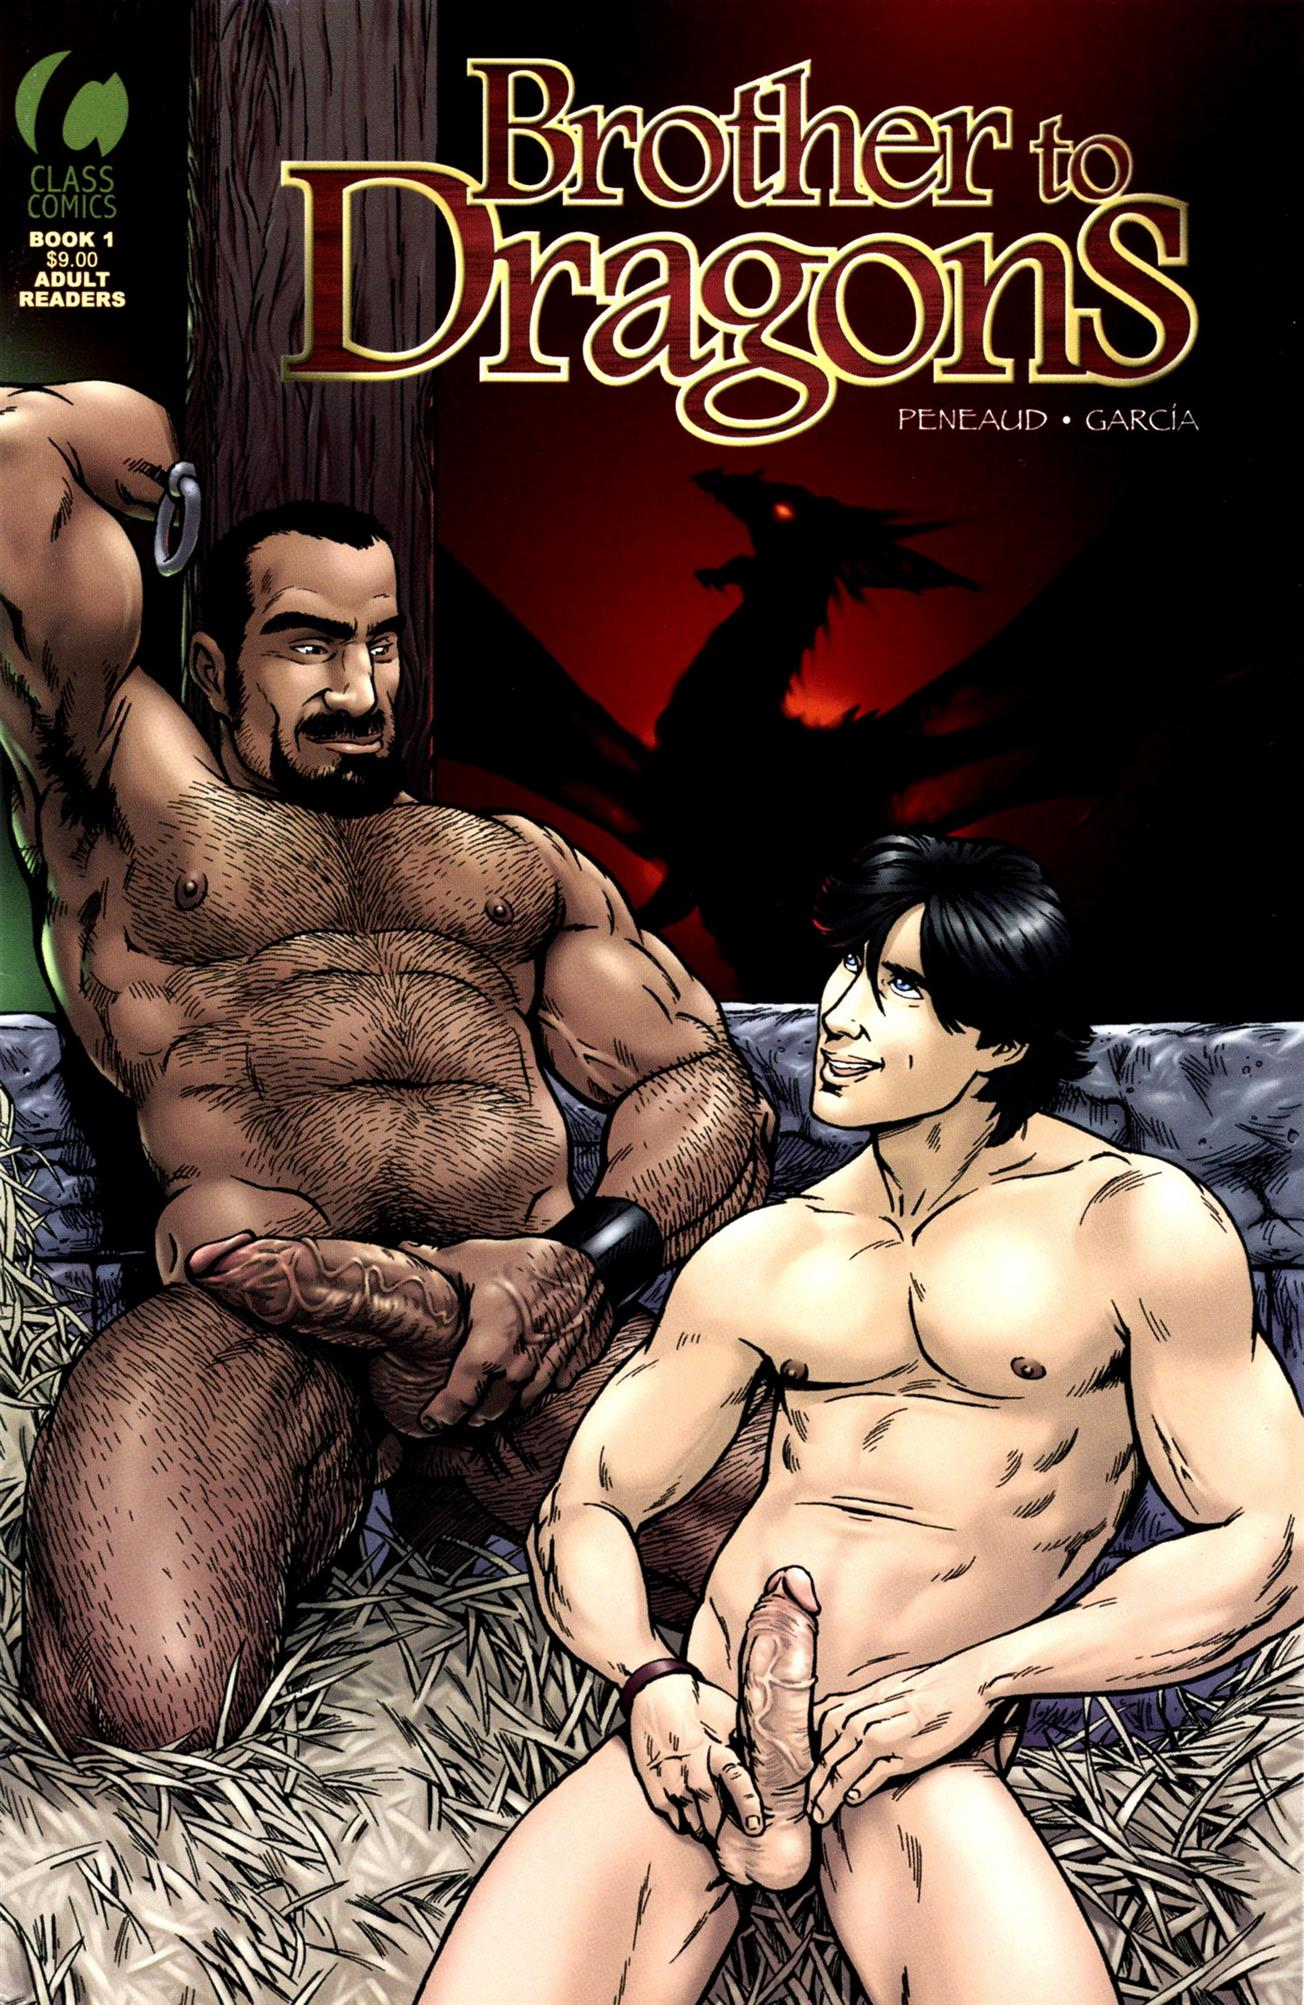 Brother to Dragons [Carlos Garcia]